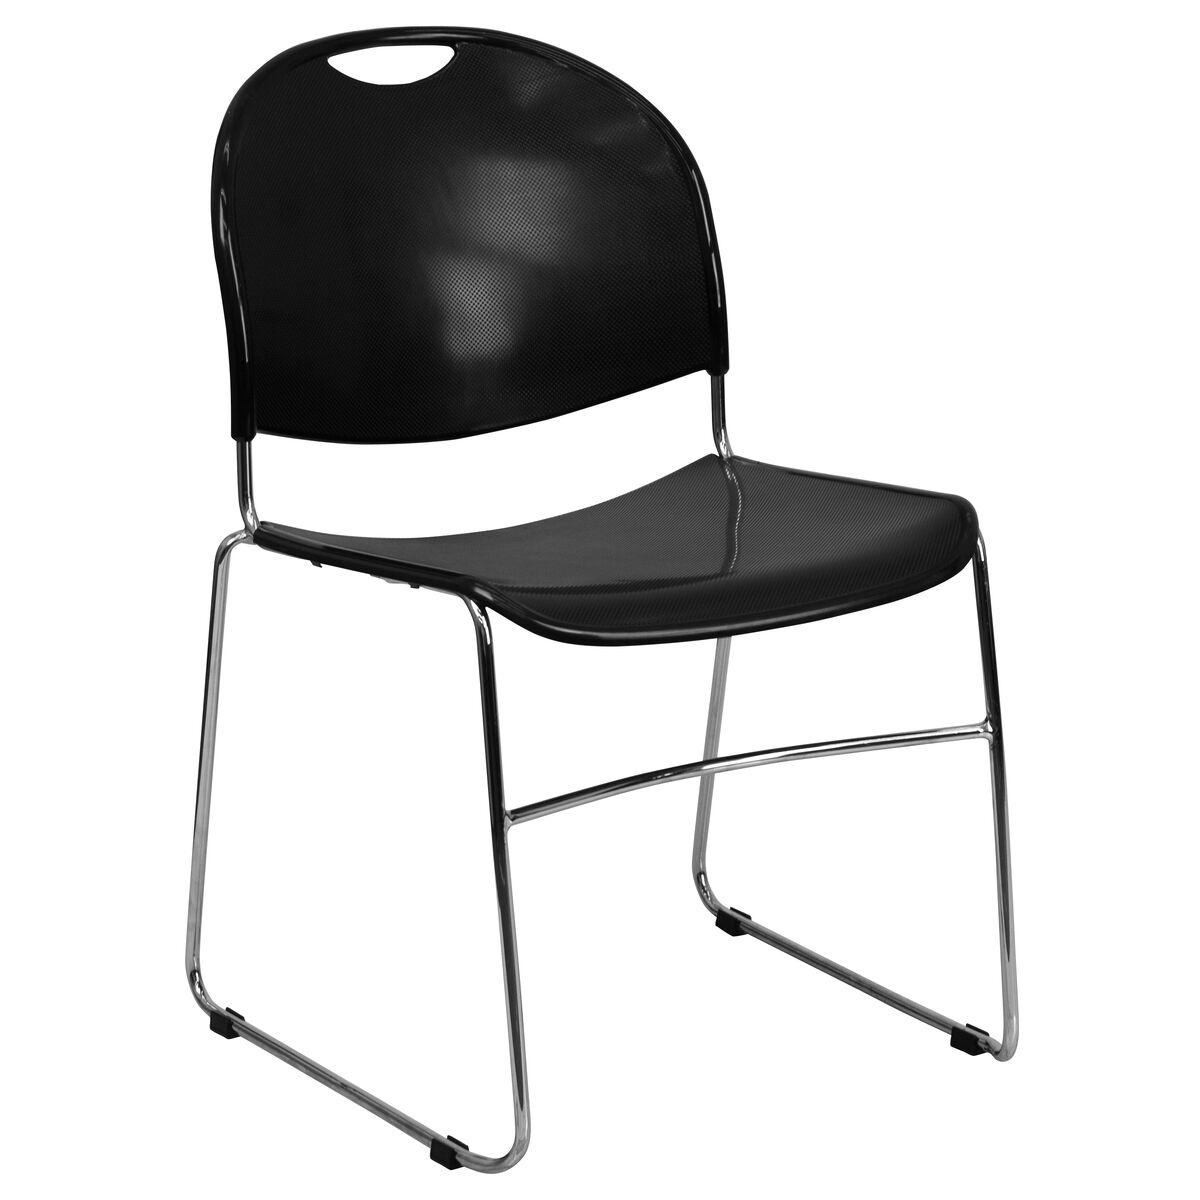 Tobago Stacking Chair Brown Chrome: Black Stack Chair-Chrome Frame RUT-188-BK-CHR-GG